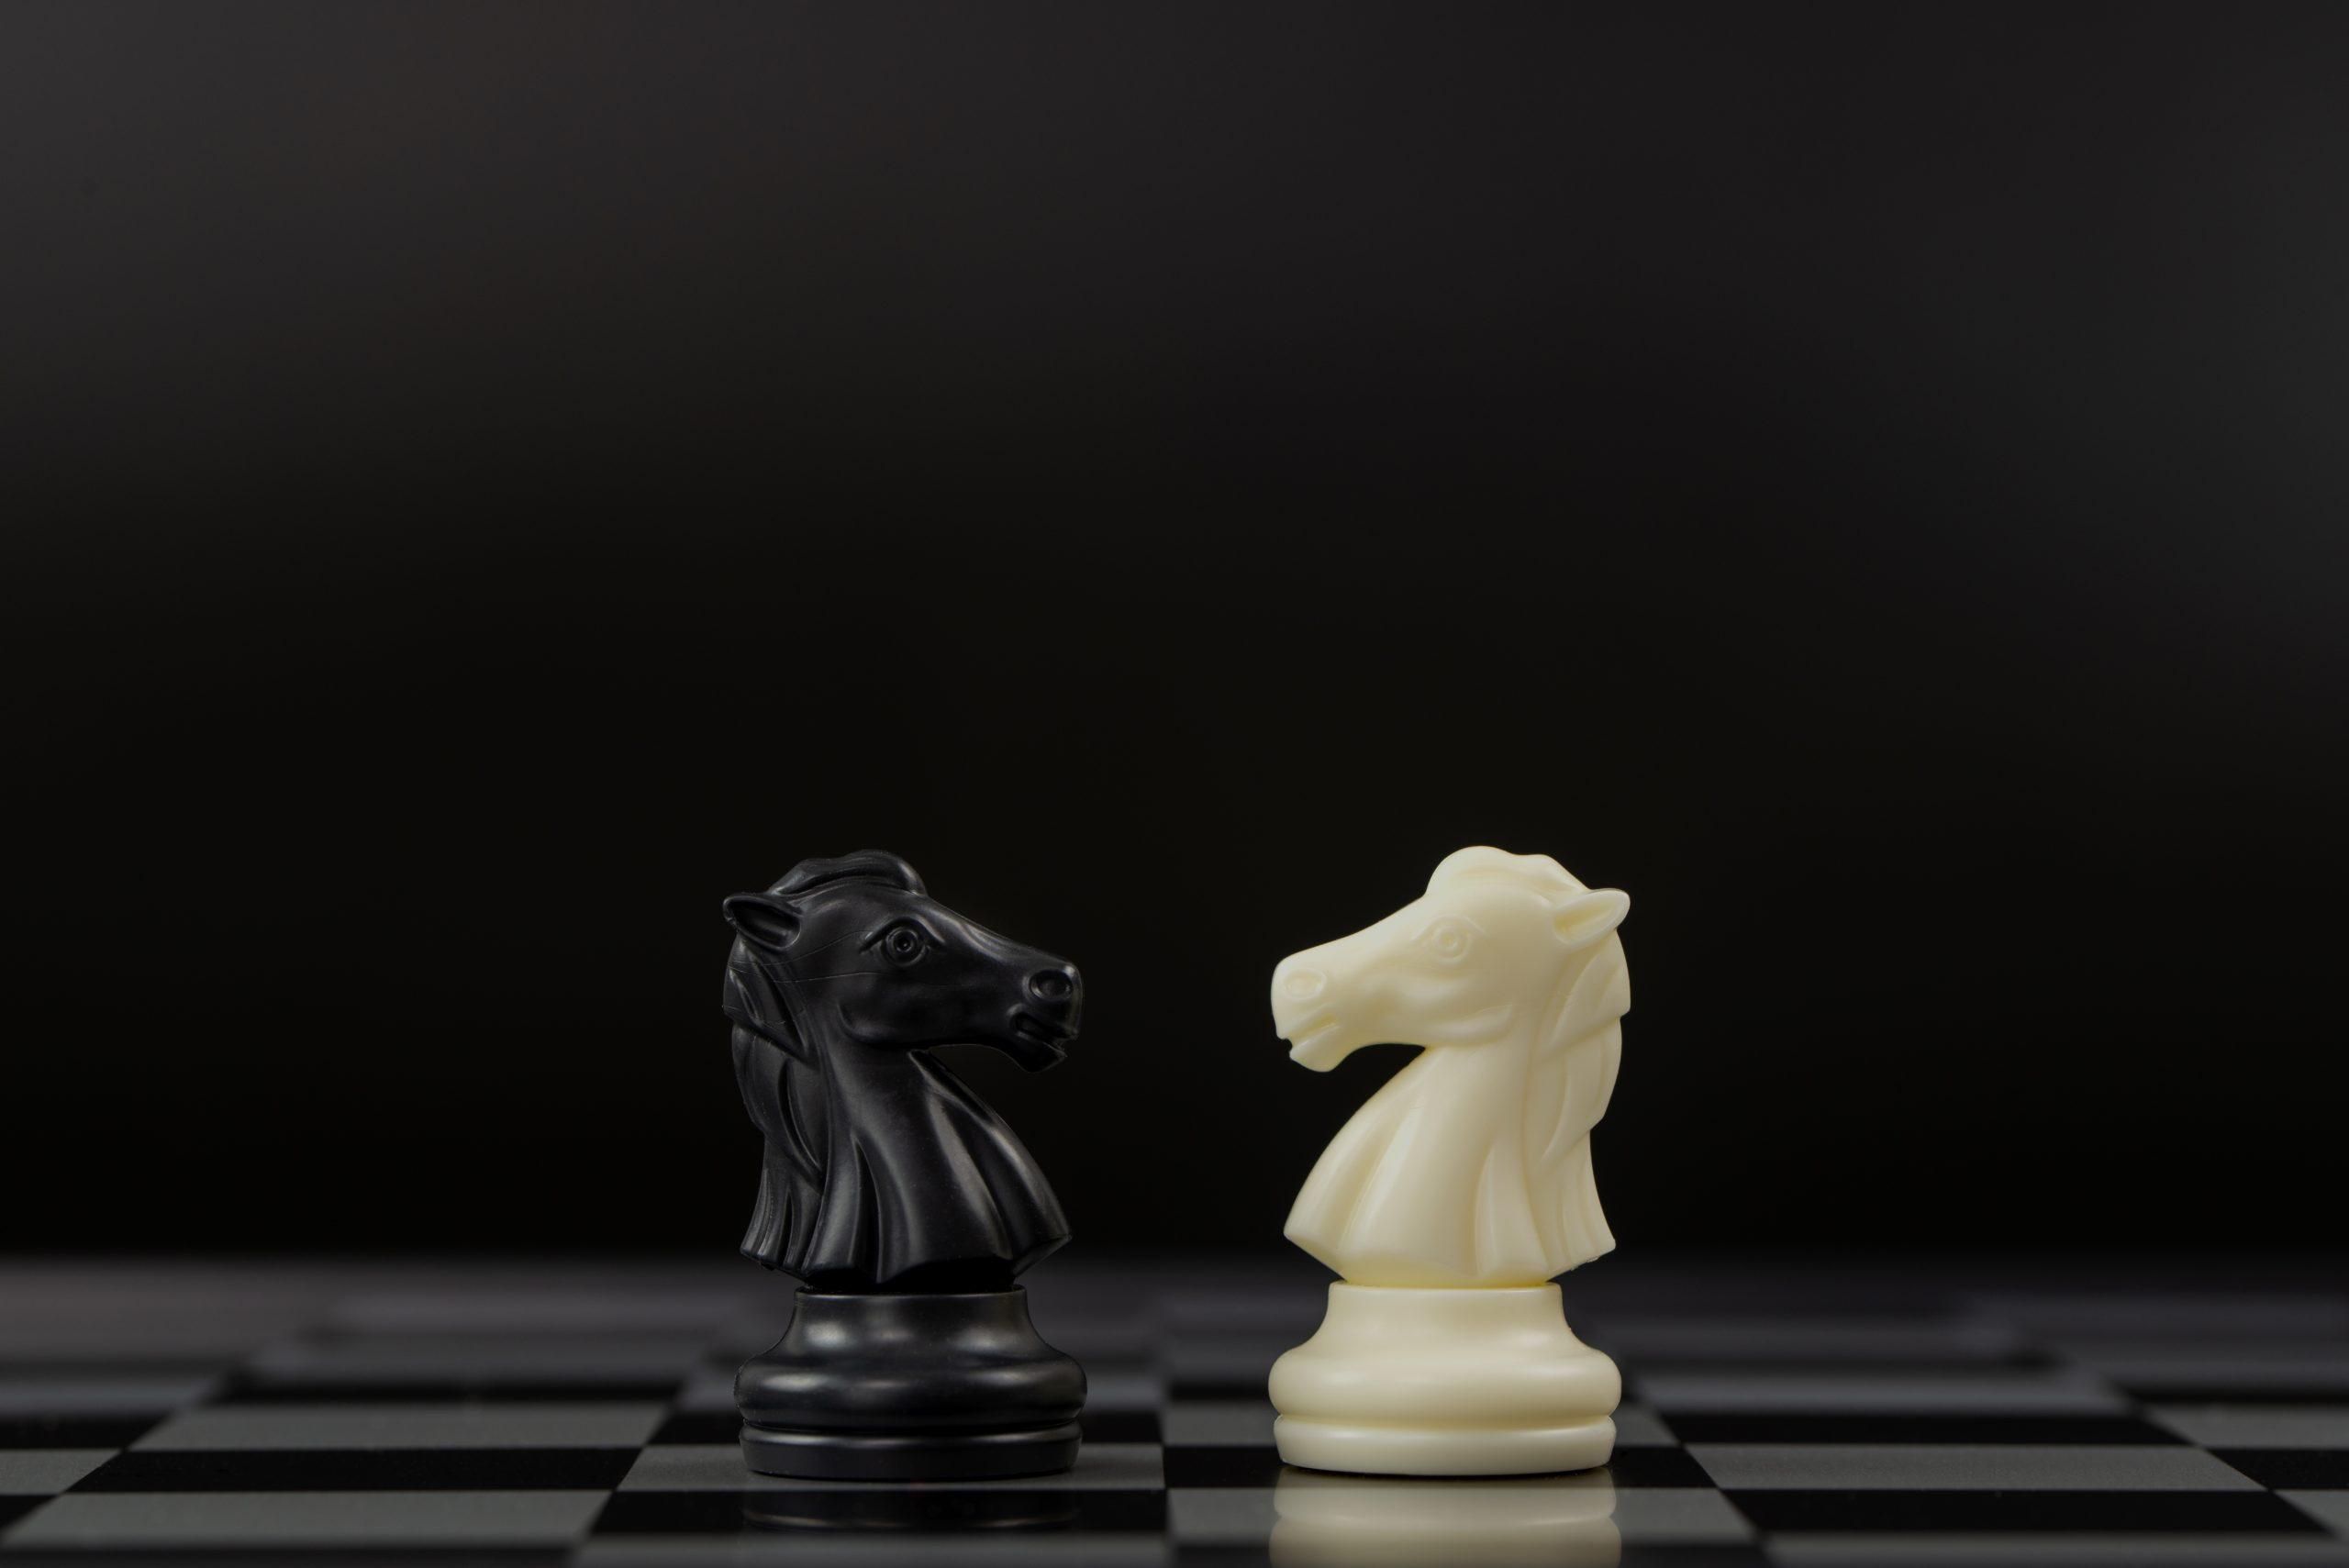 Dropshipping vs Amazon FBA: A Fulfillment Battle